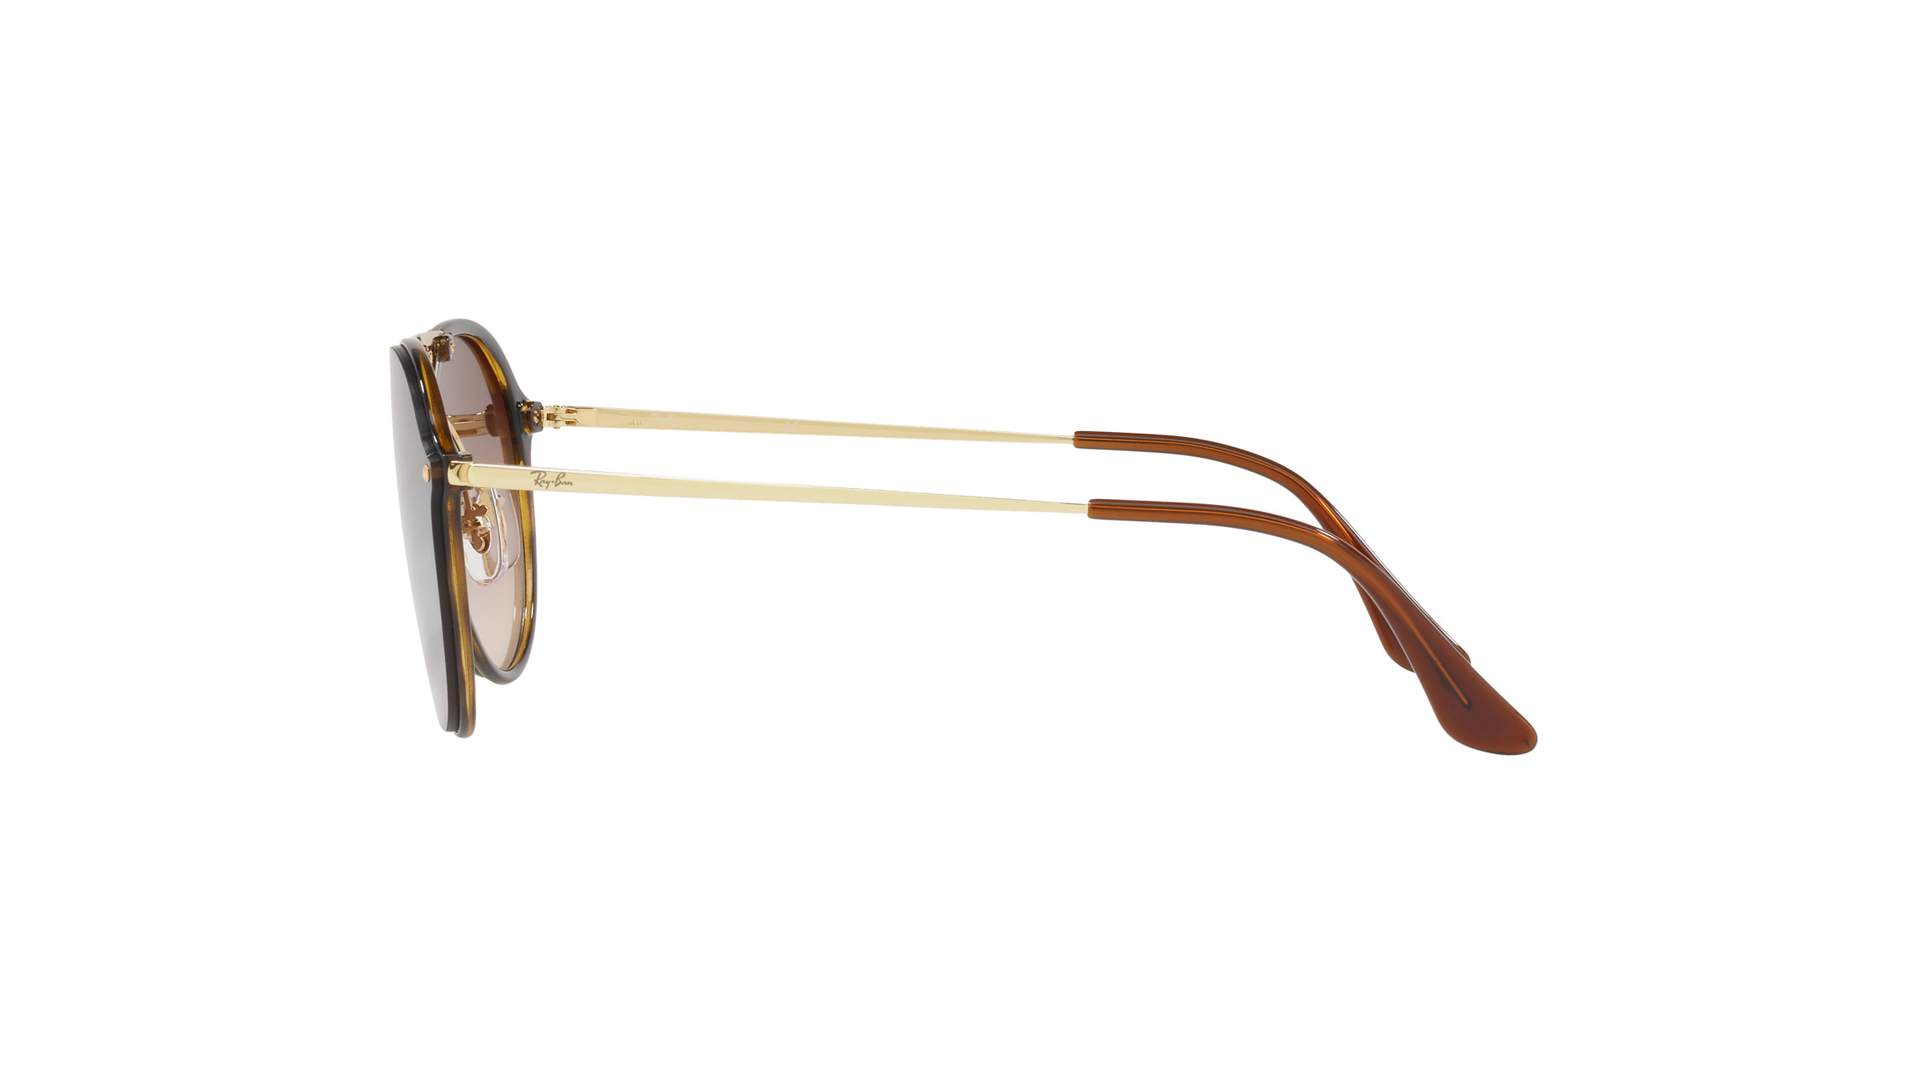 66fecf66dbc Sunglasses Ray-Ban Blaze Double Bridge Gold RB4292N 710 13 62-14 Large  Gradient